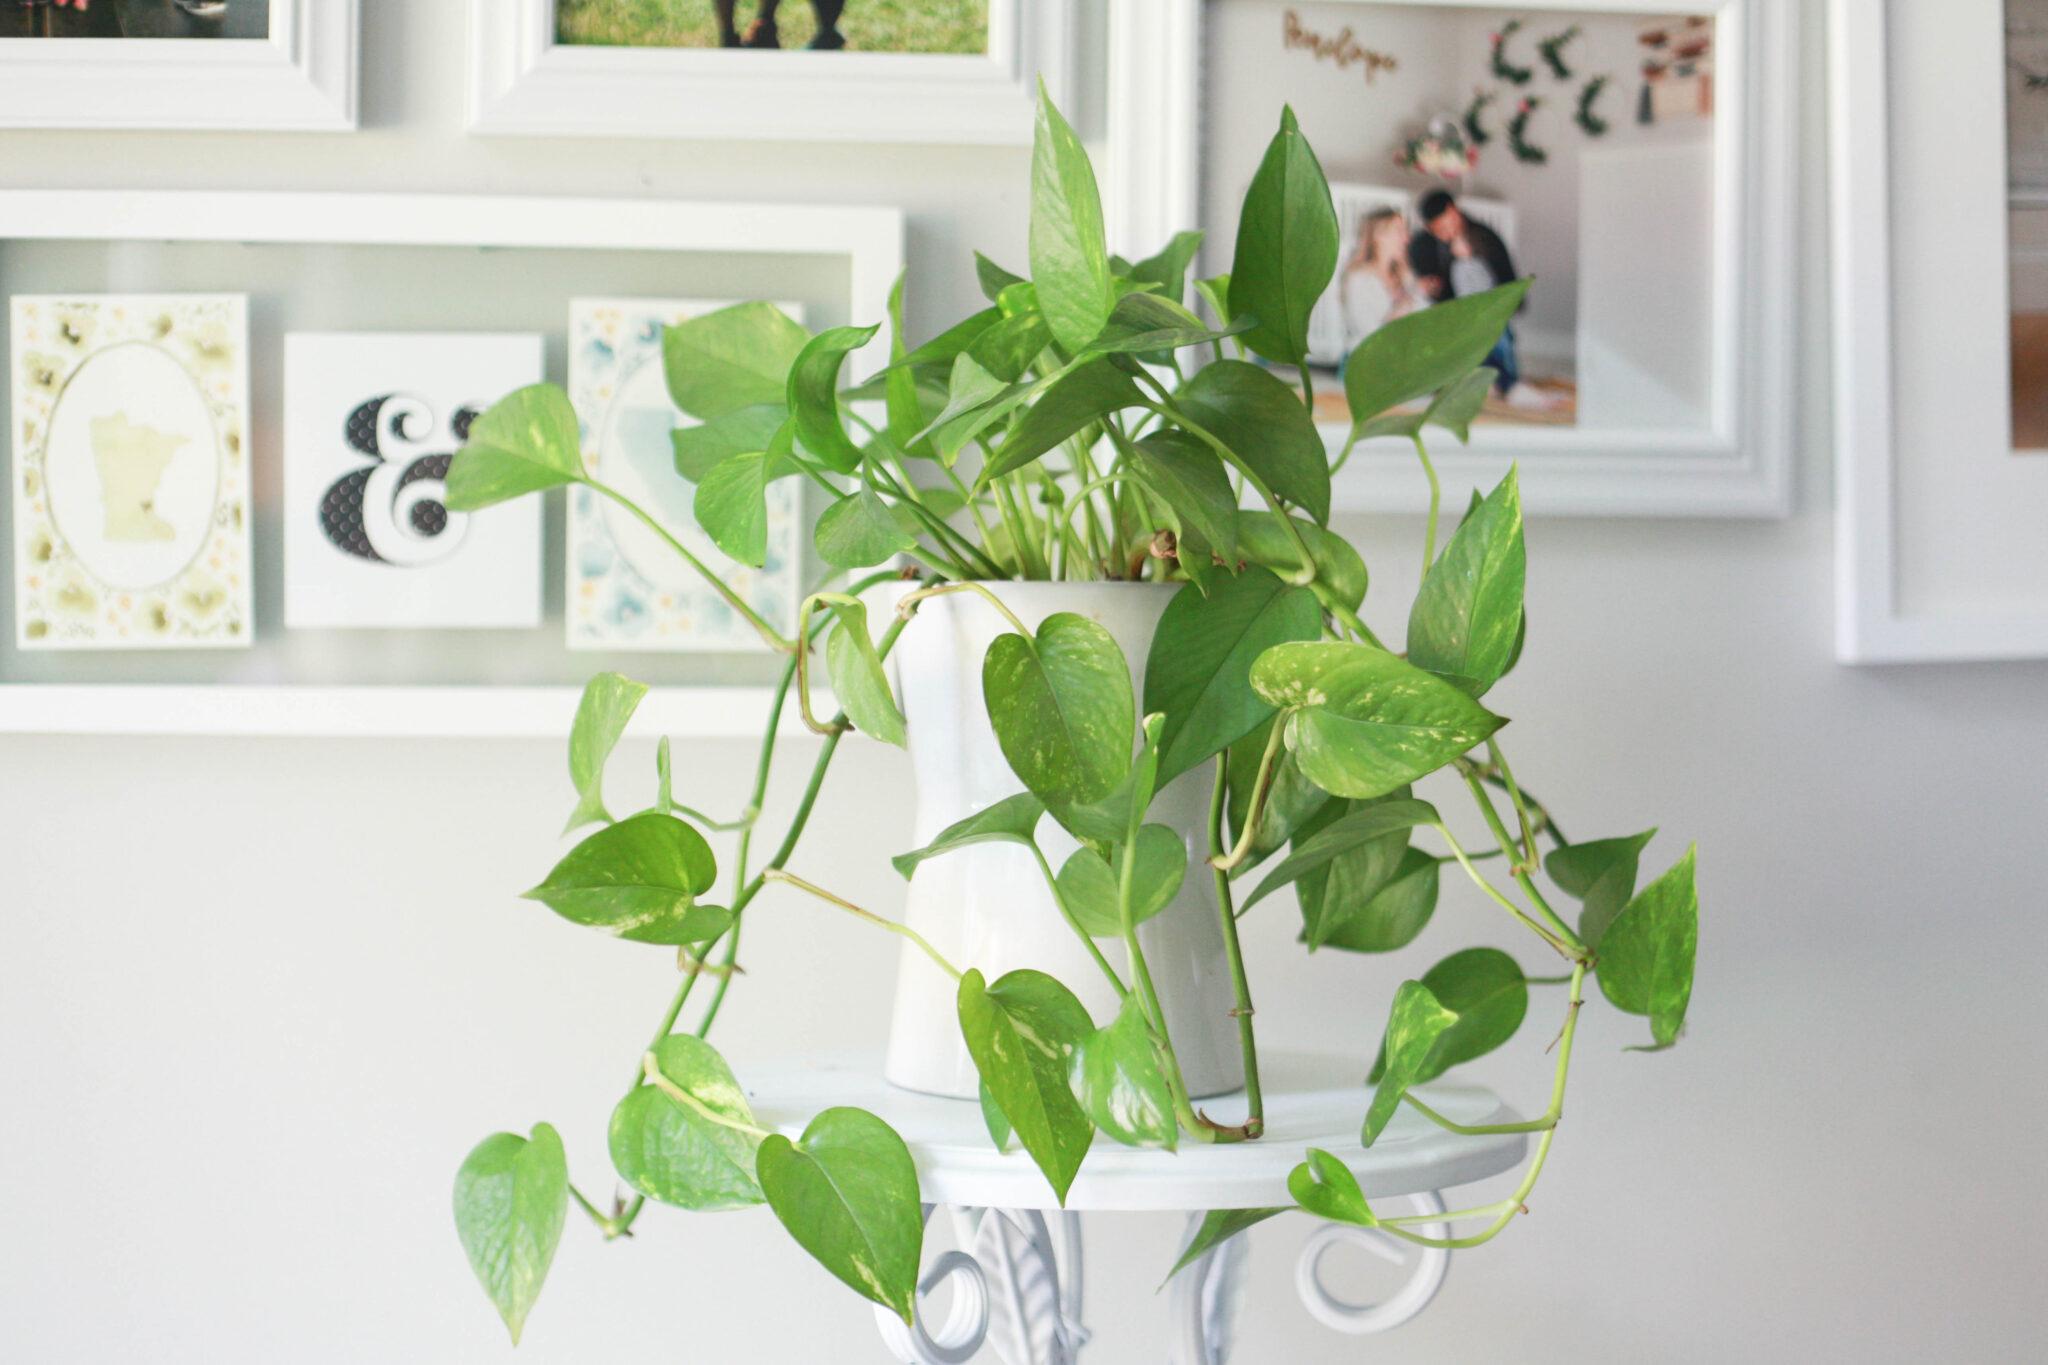 pothos plant care - how to grow and propagate #pothosplant #houseplant